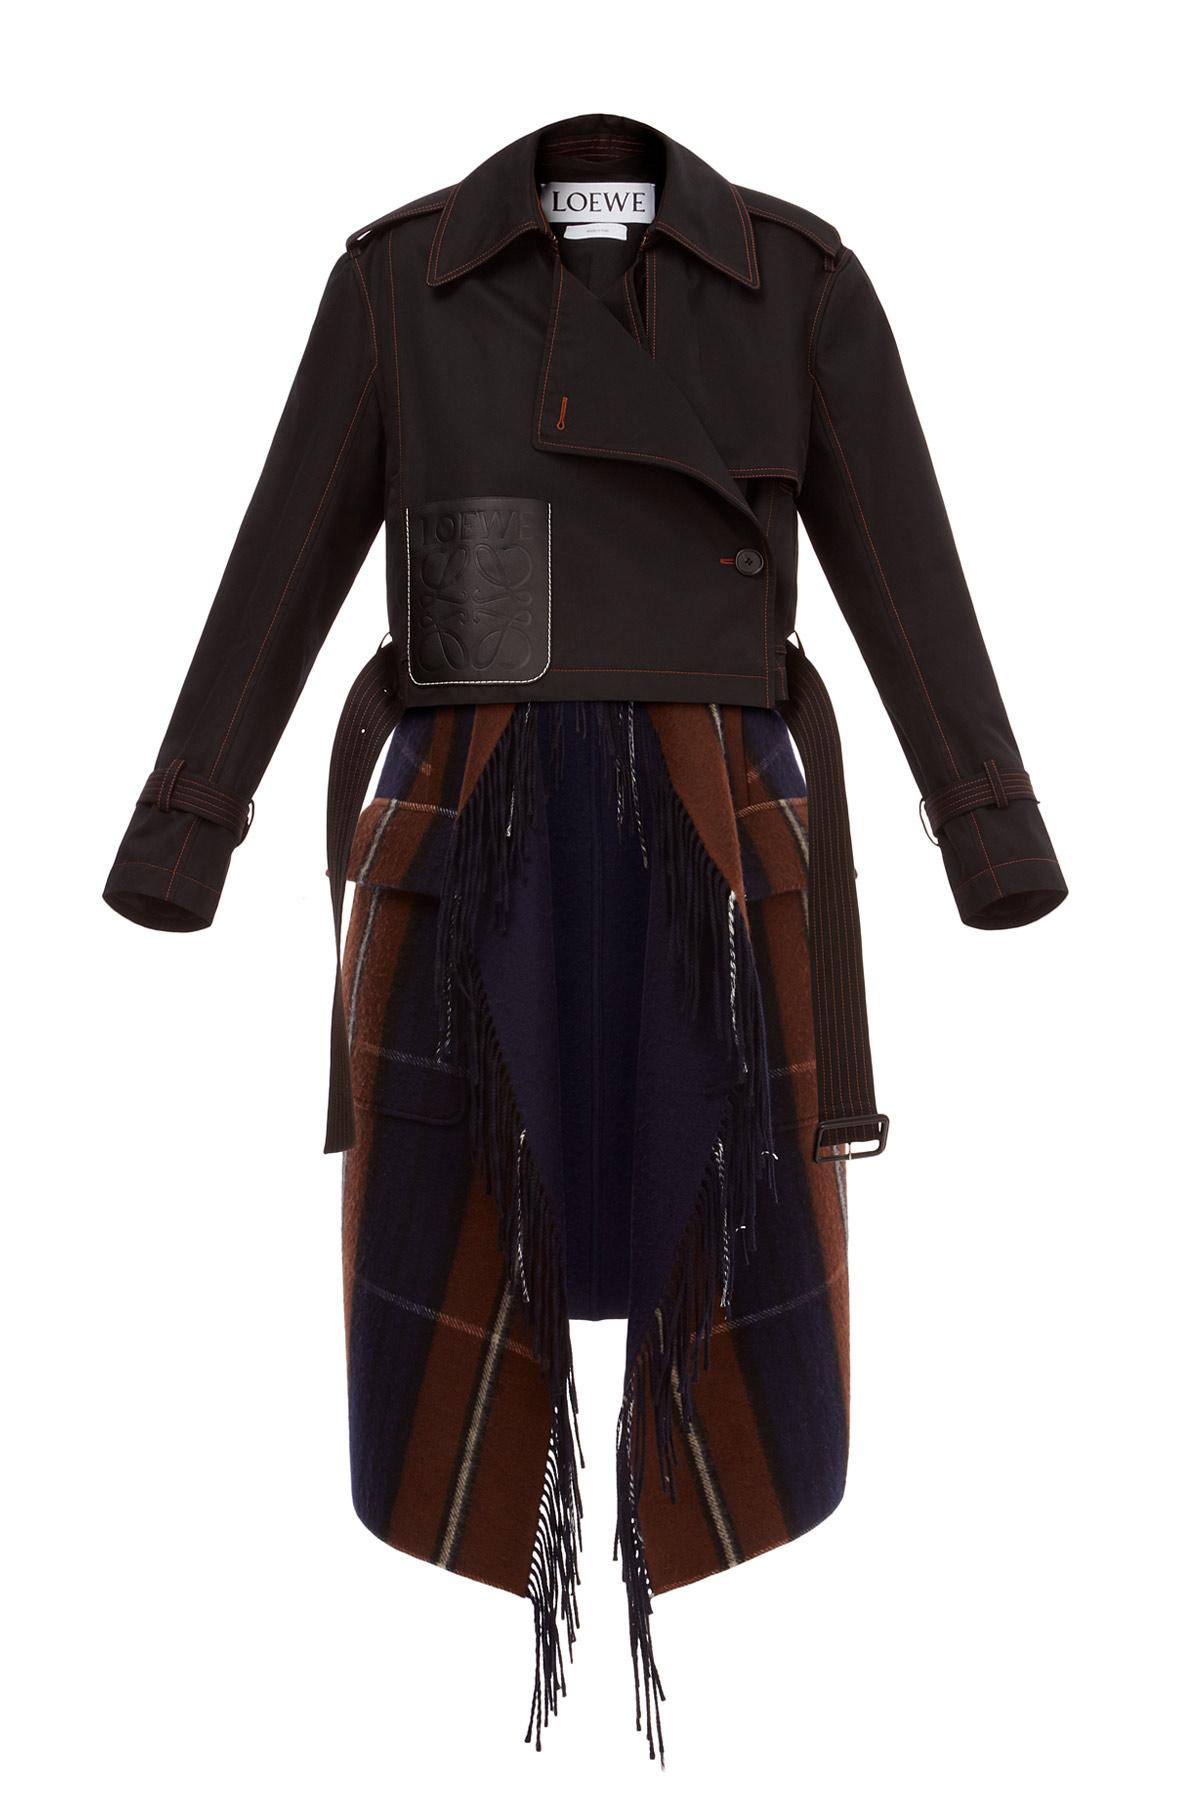 LOEWE Blanket Trenchcoat Black/Chocolate front